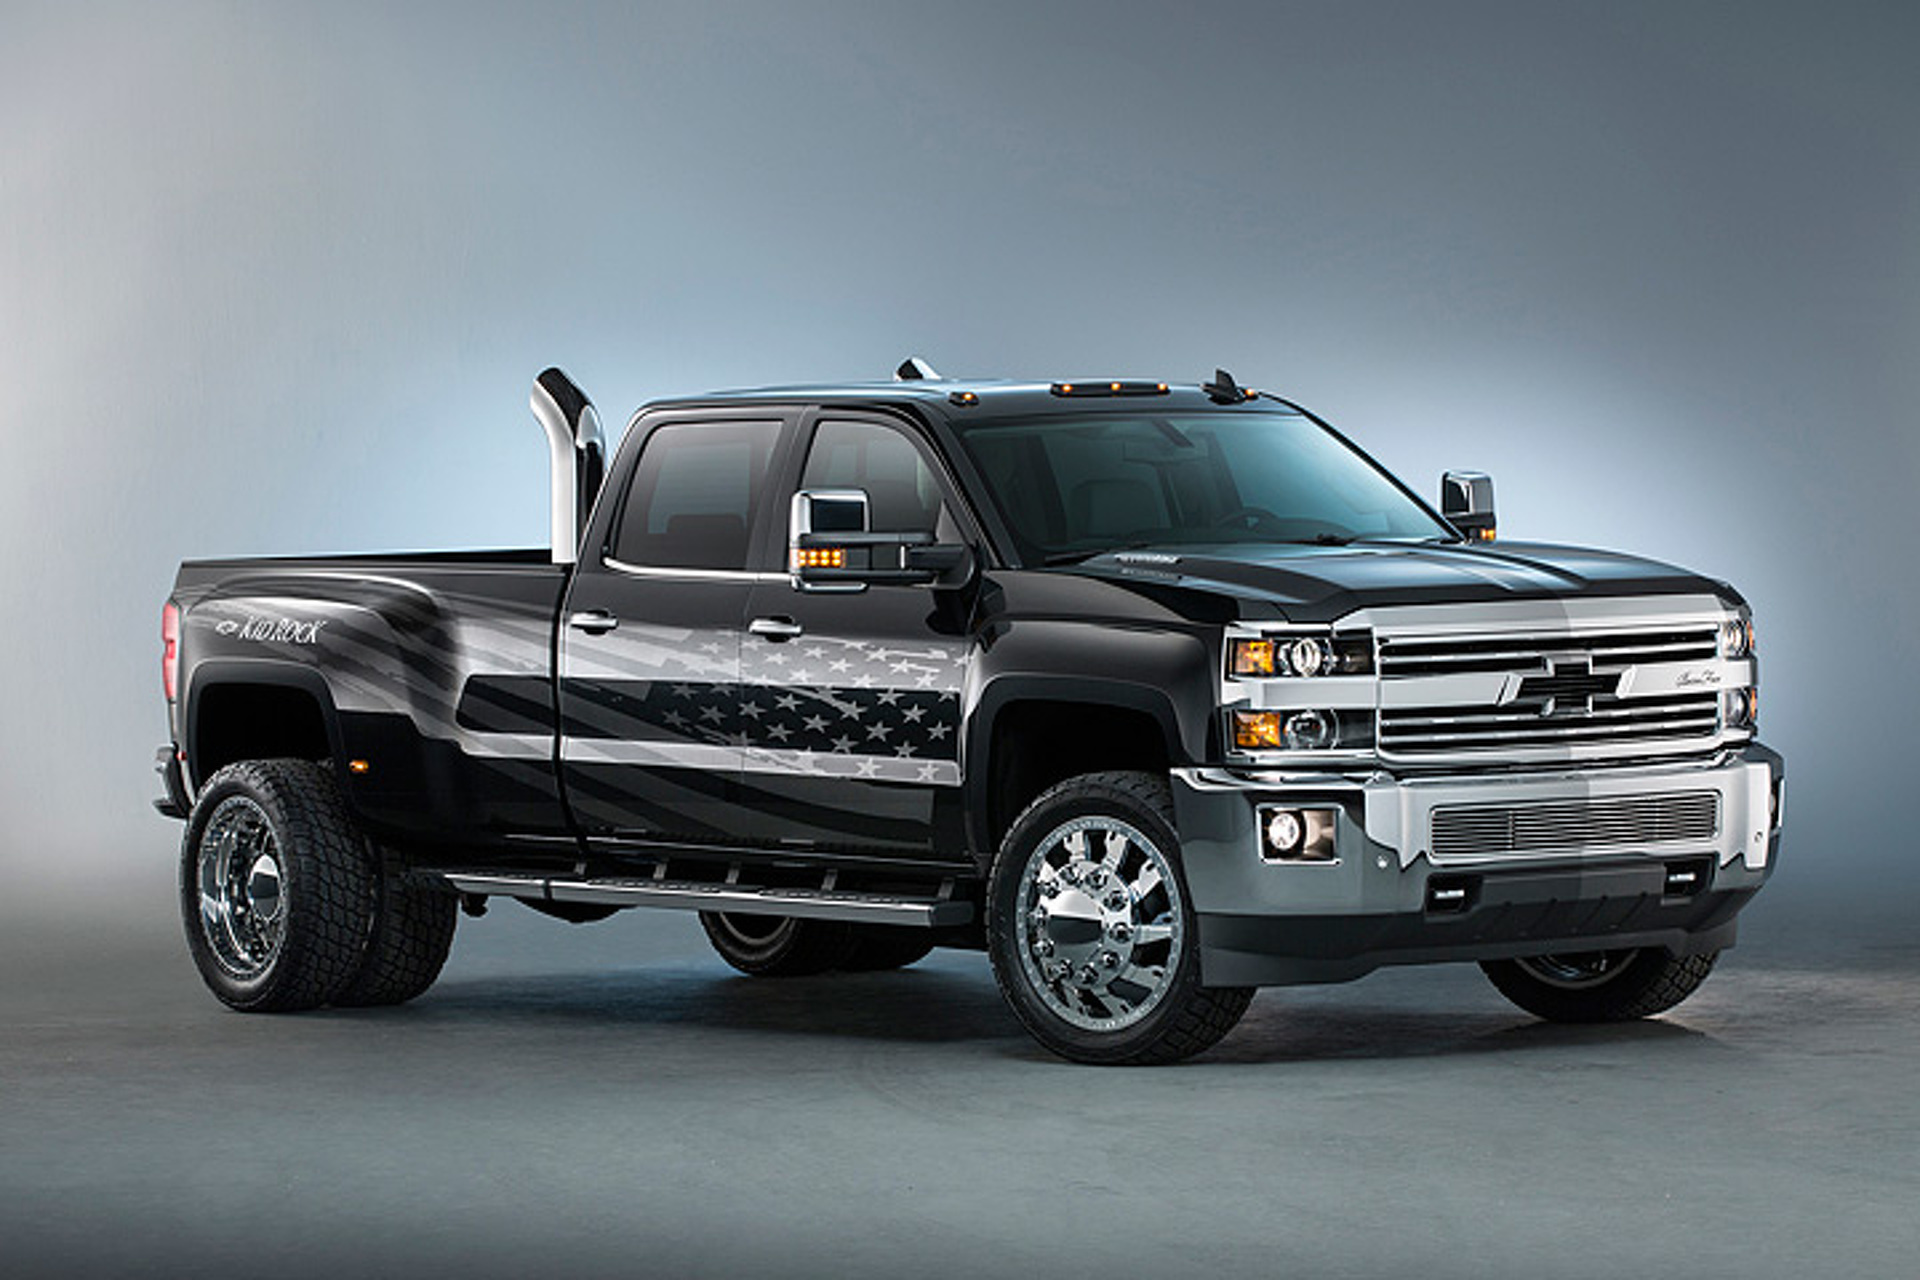 Custom Chevy Silverado >> Kid Rock S Custom Chevy Silverado Goes Big For U S Workers